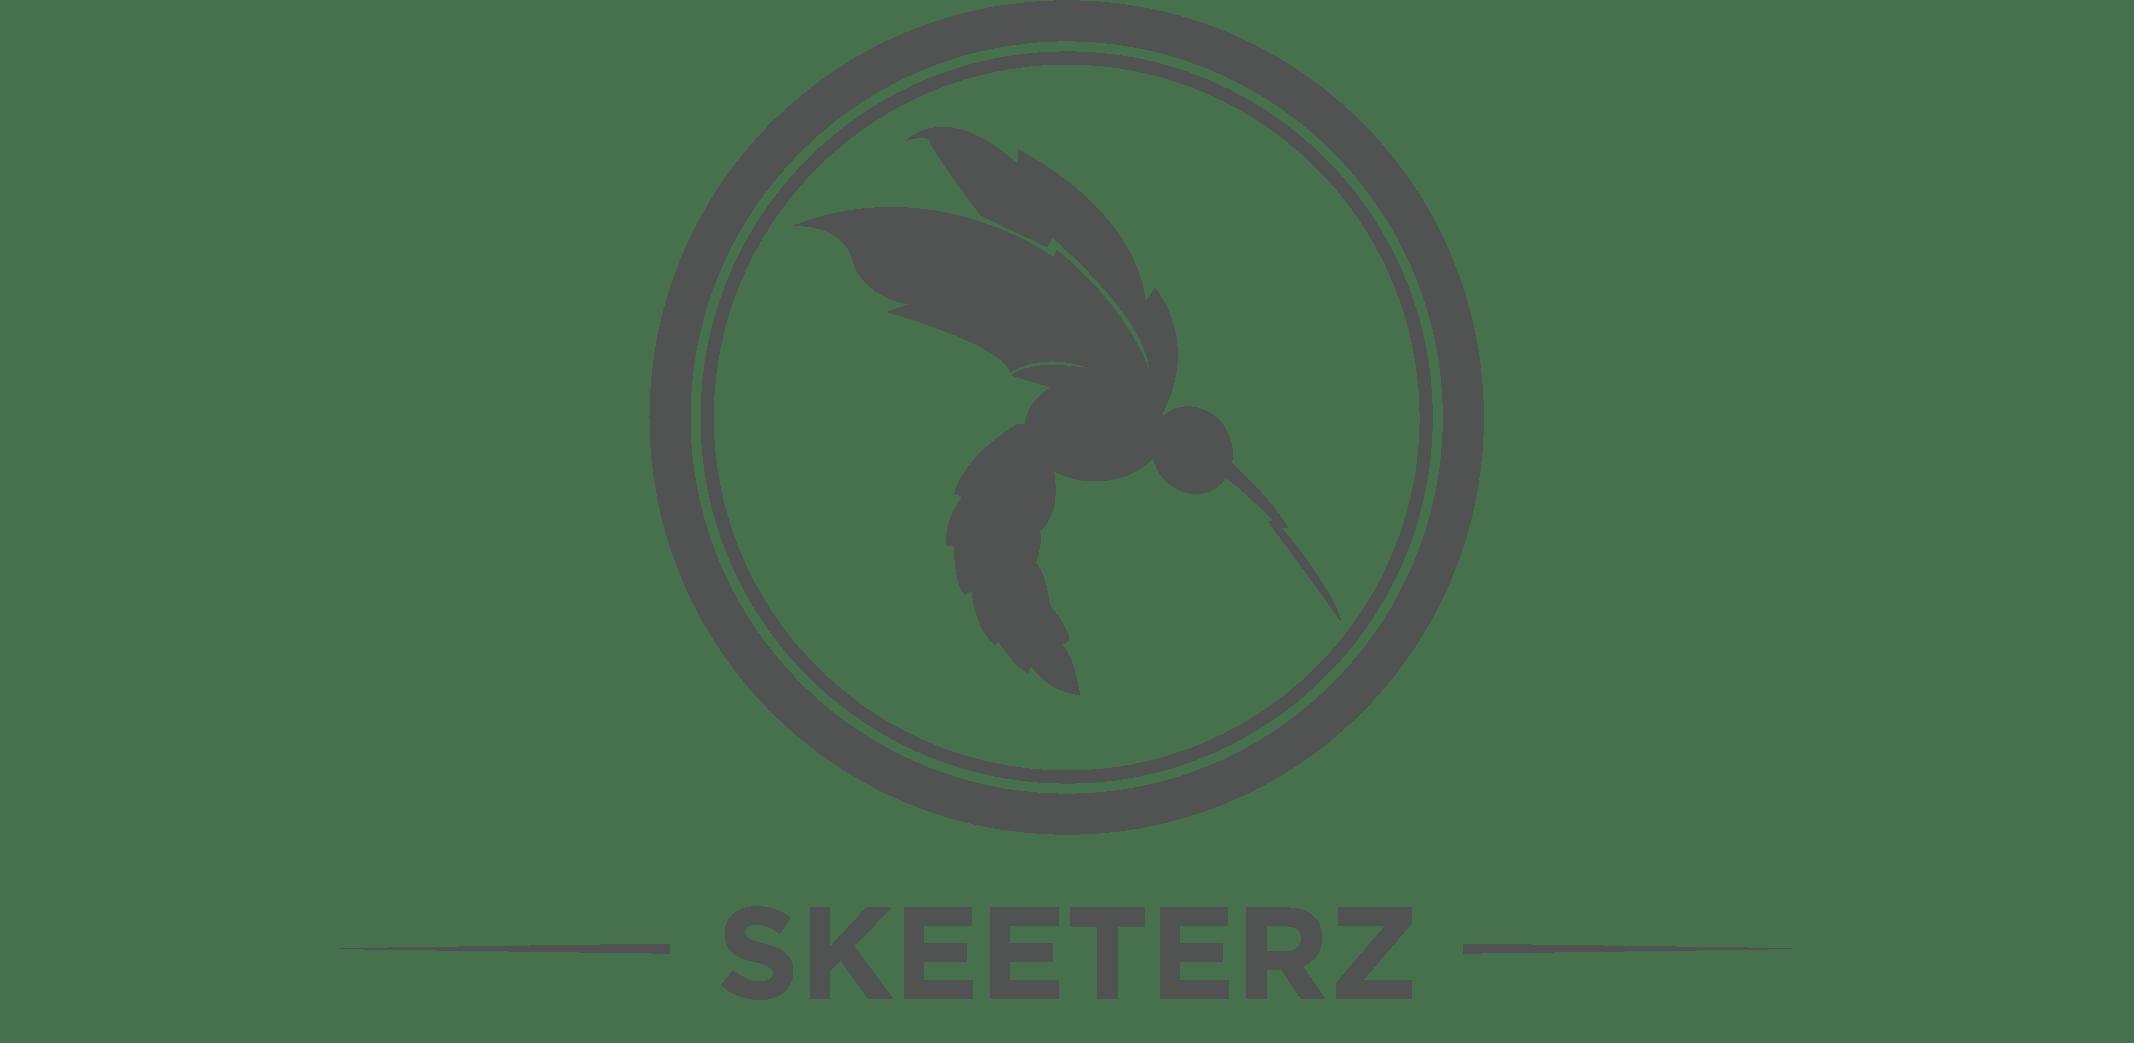 Skeeterz brand logo